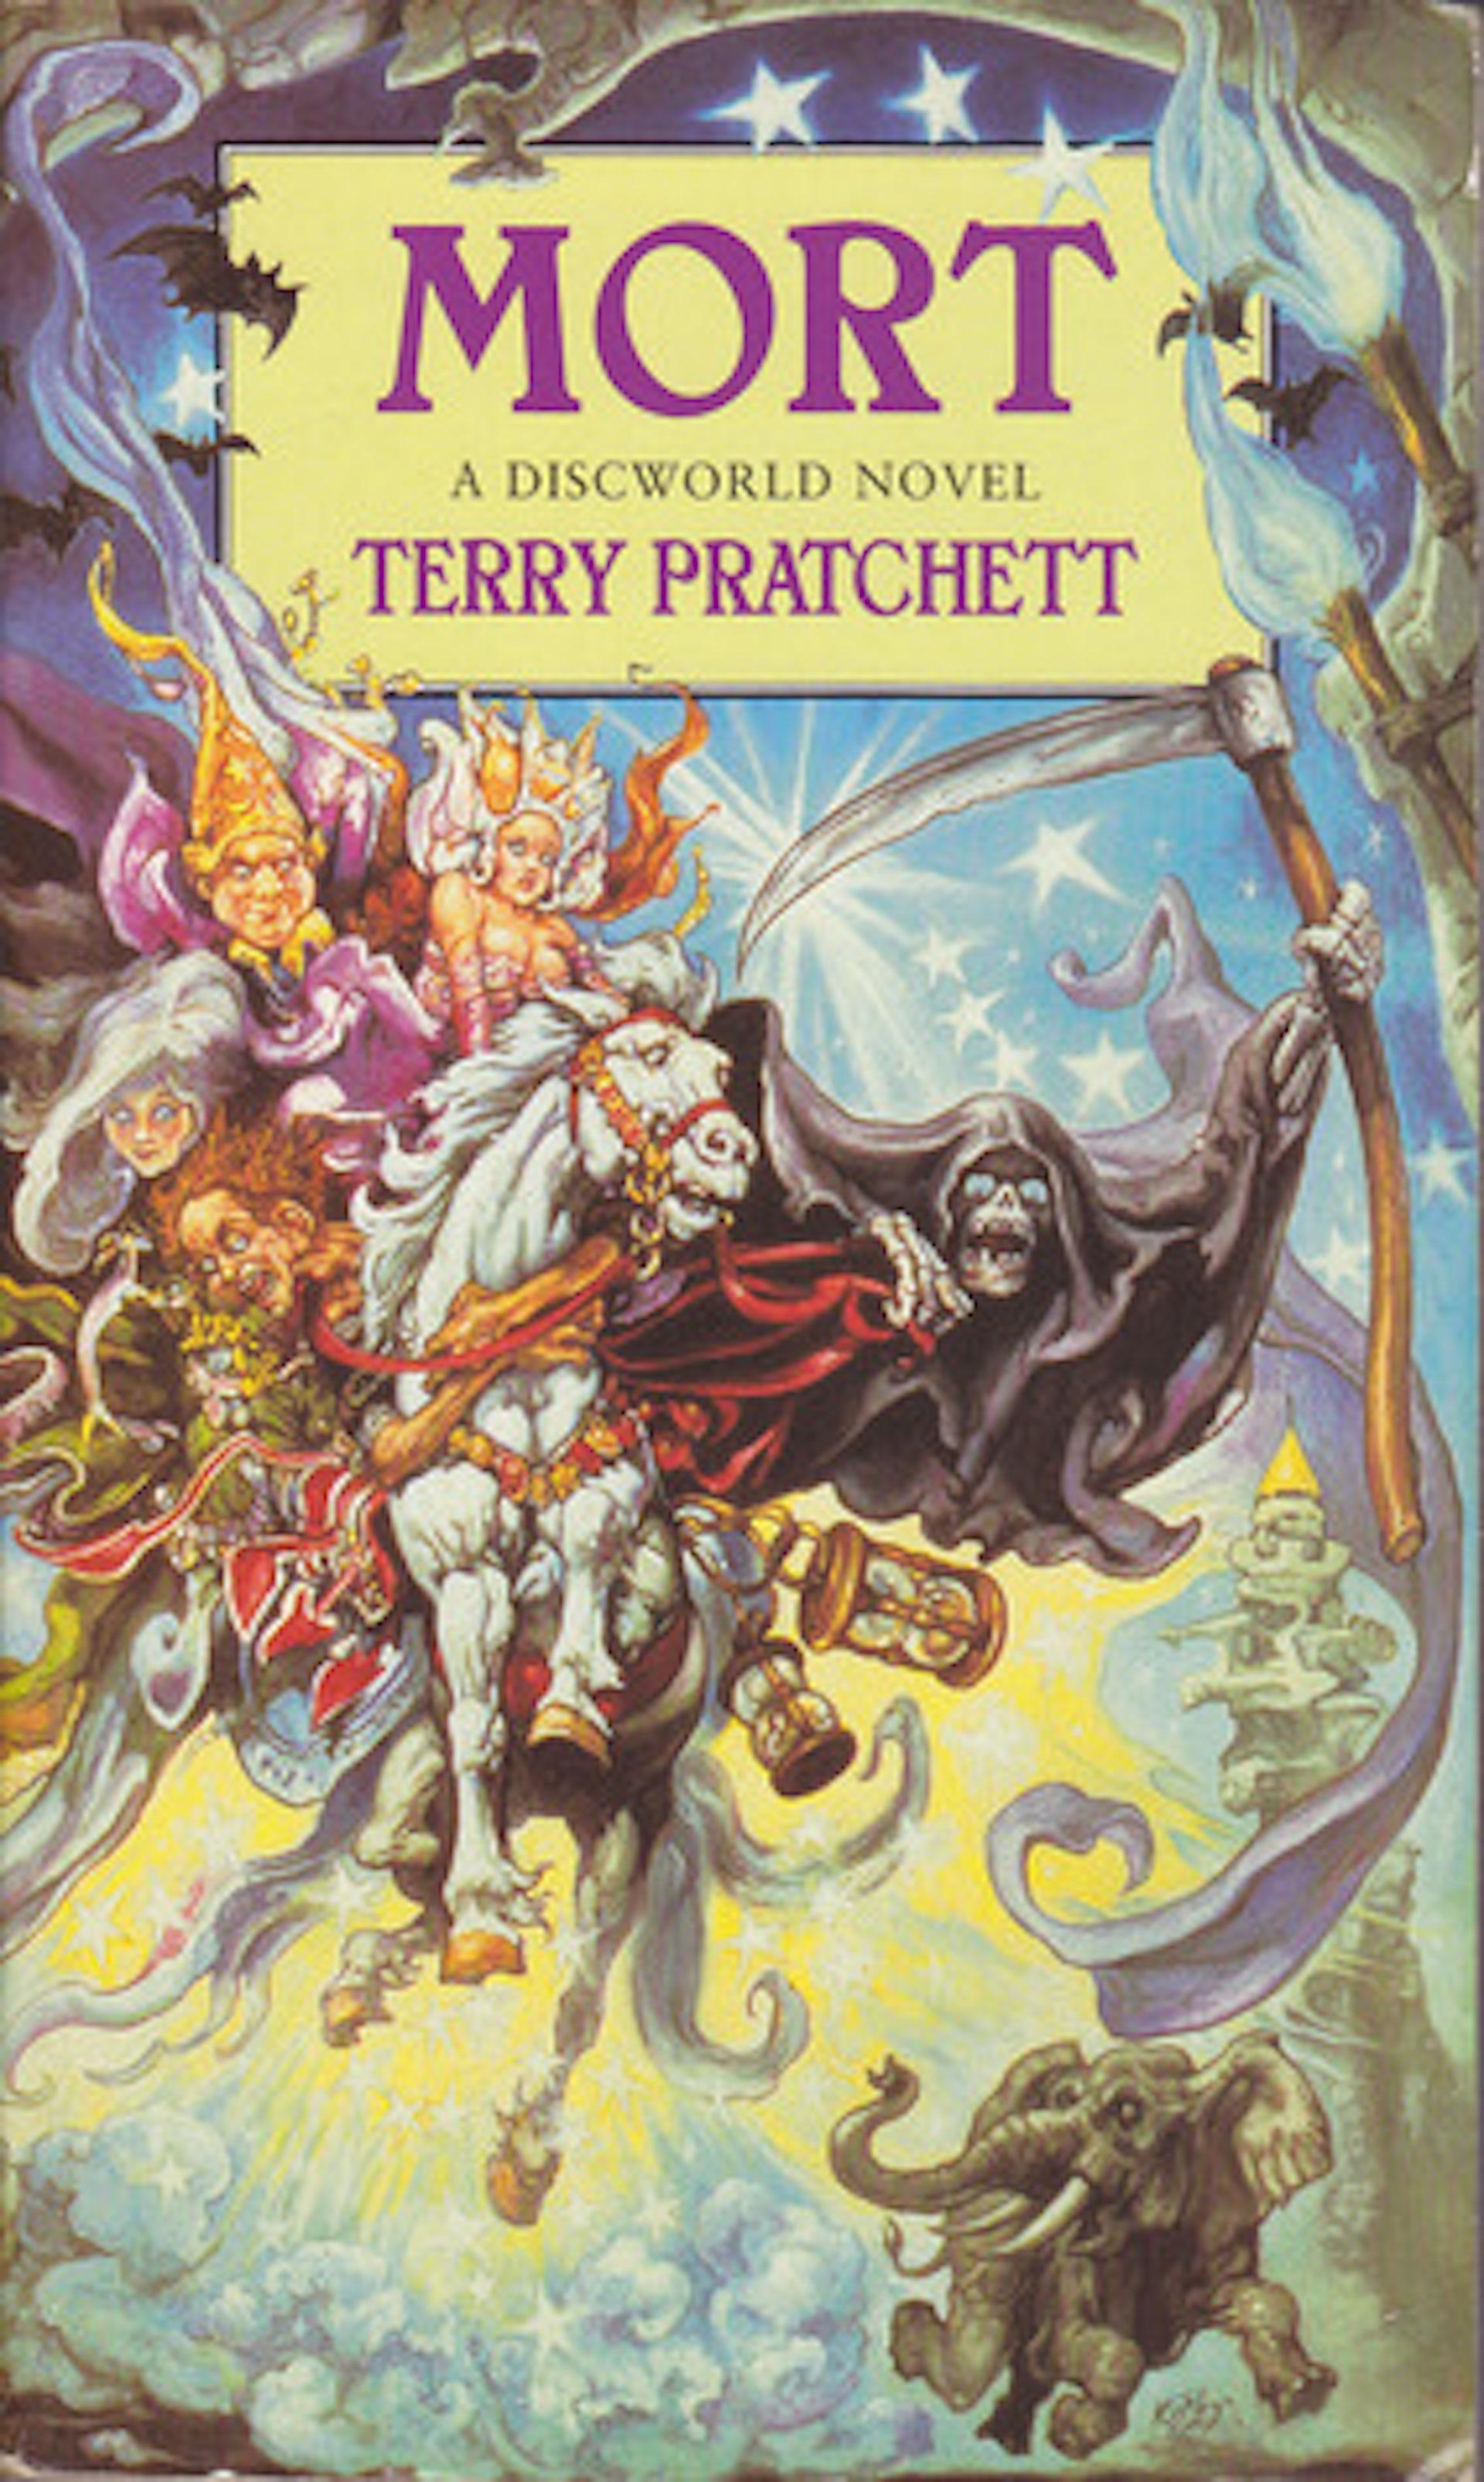 A beginner's guide to Terry Pratchett's Discworld